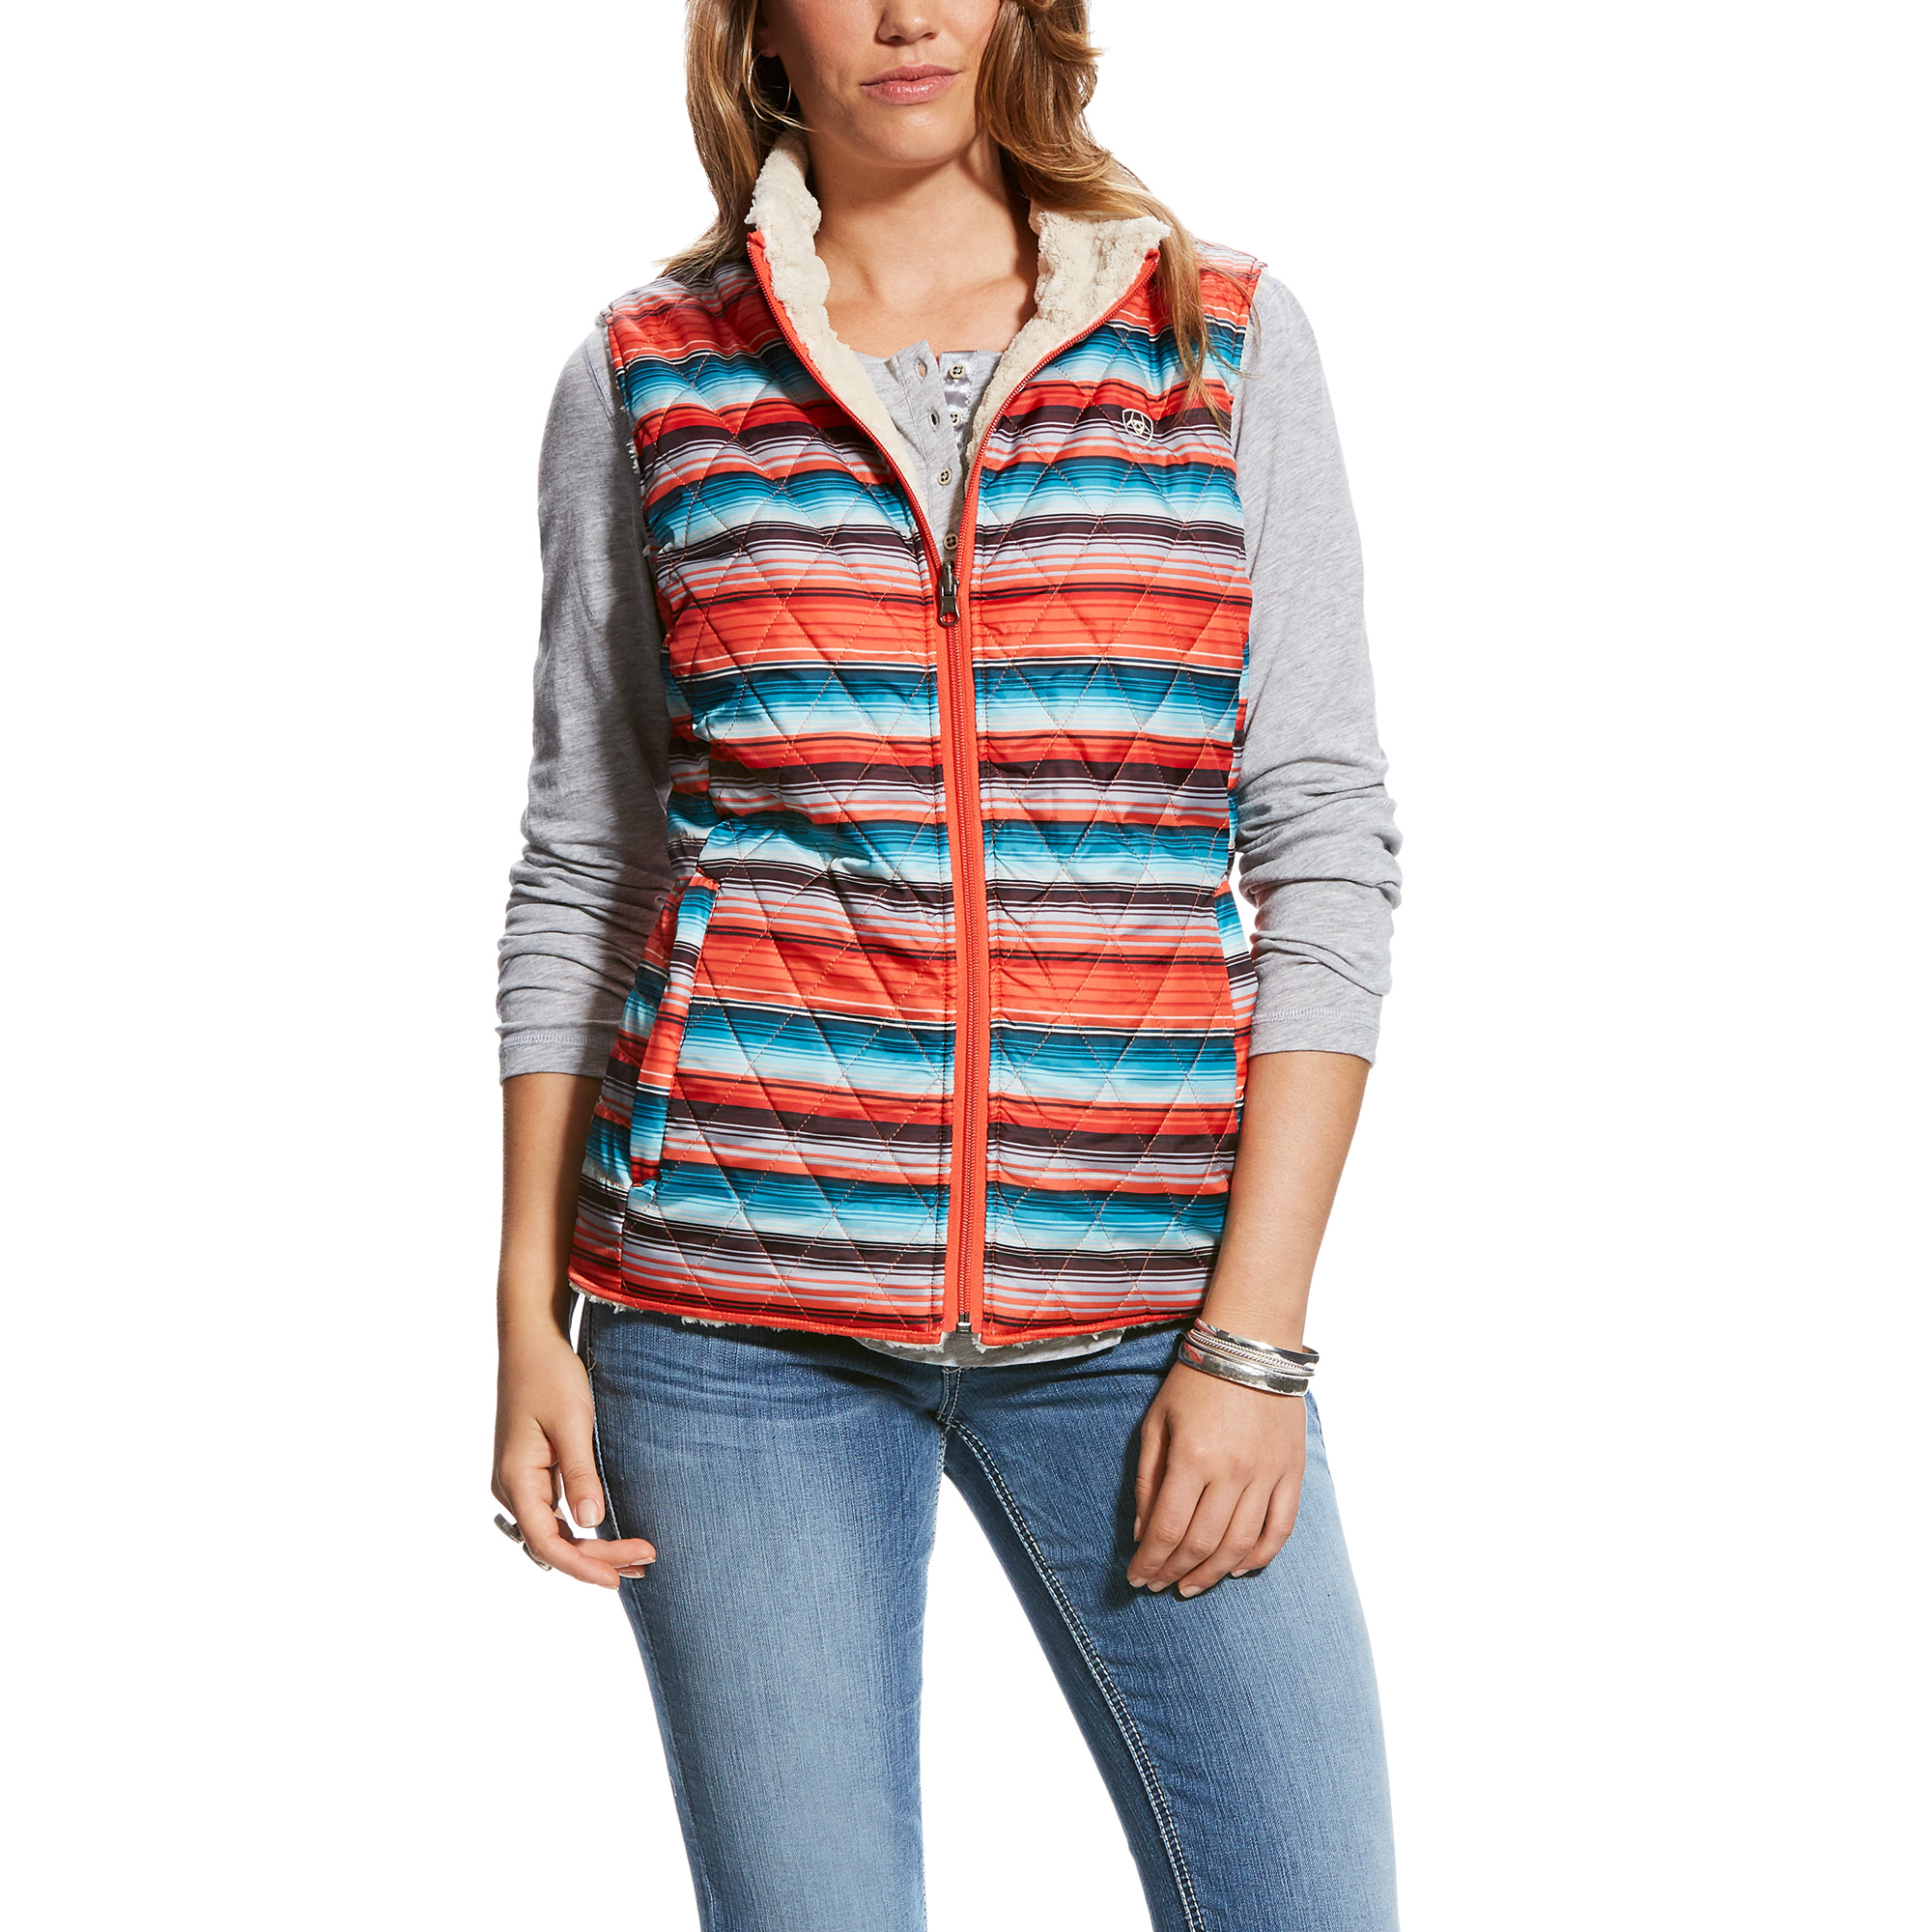 Ladies Hallstatt Reversible Vest from Ariat